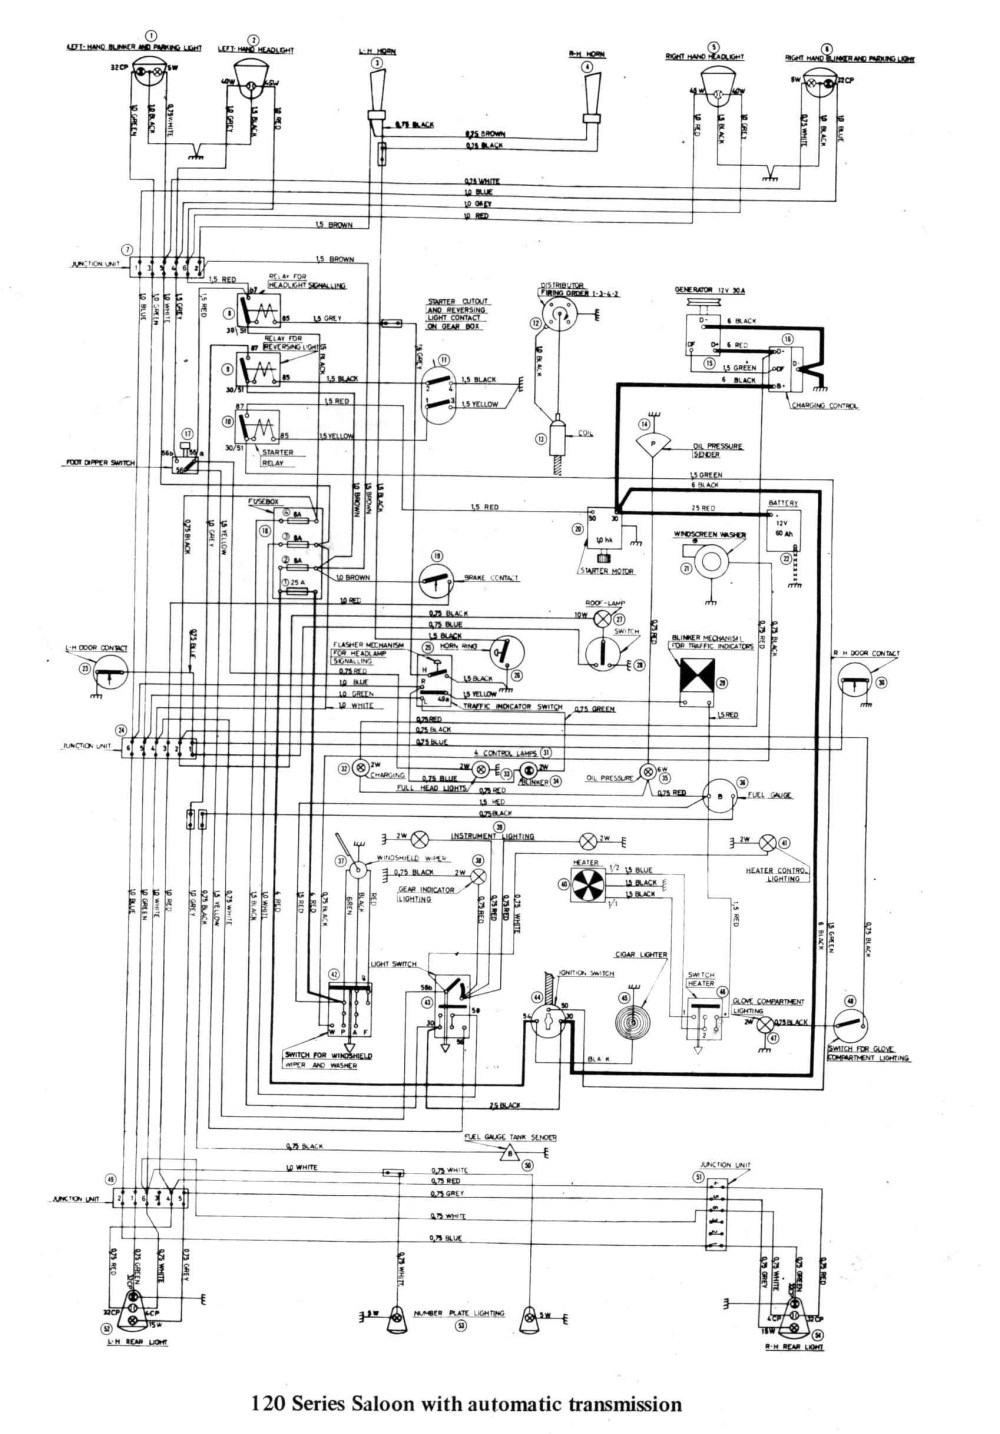 medium resolution of 1975 chevy alternator wiring diagram 350 350 chevy alternator rh banyan palace com 78 chevy alternator